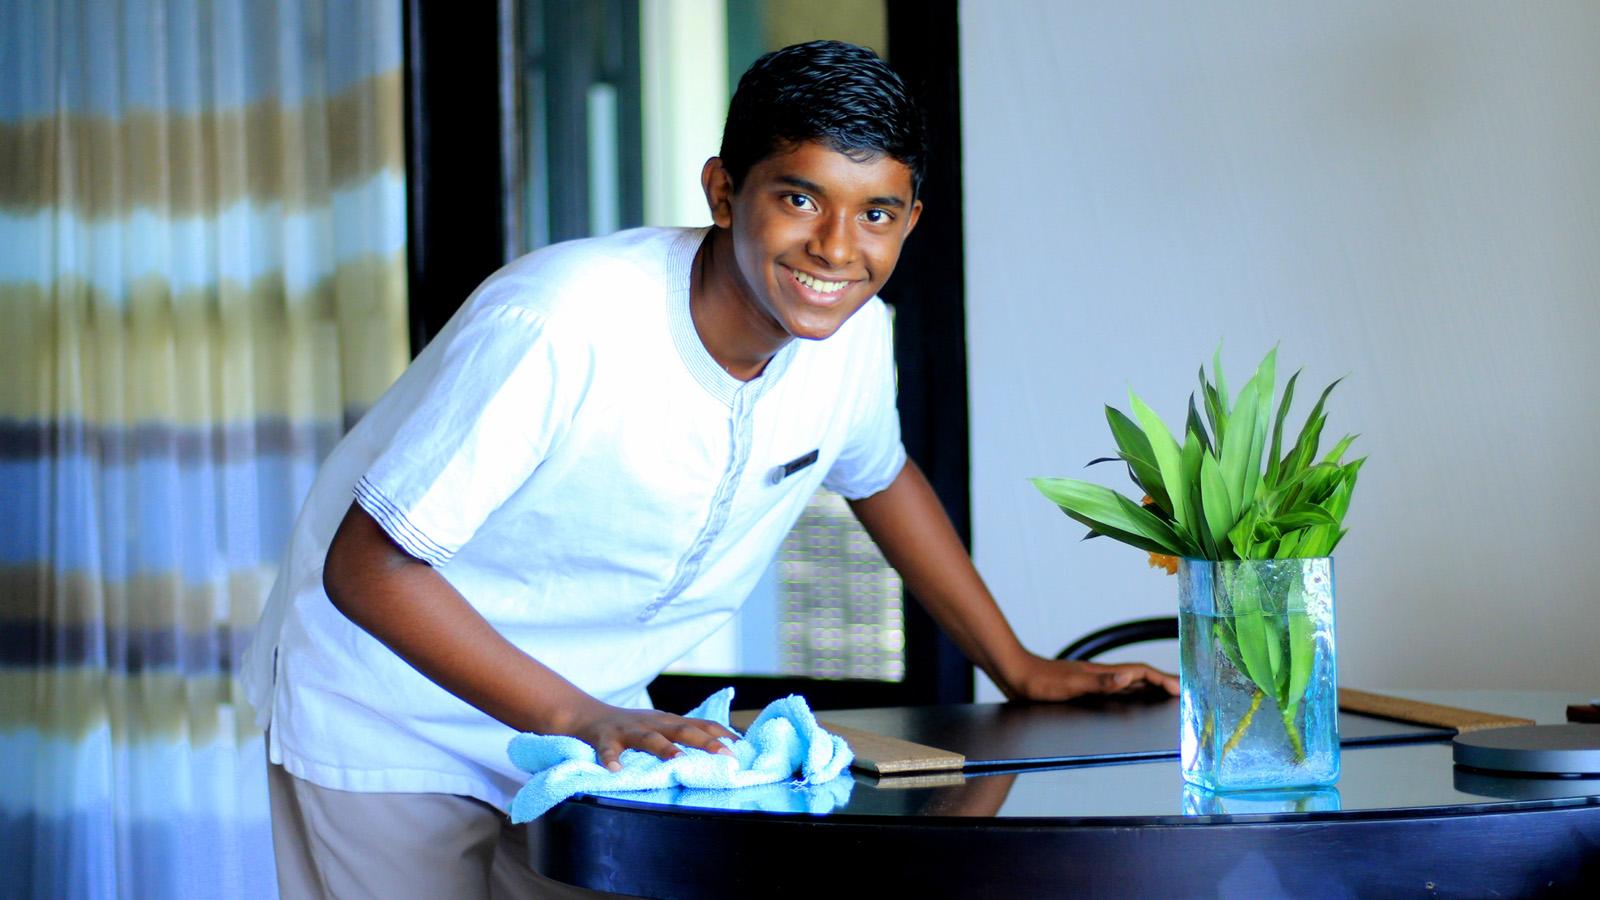 Four Seasons Resort Maldives Hospitality Apprenticeships